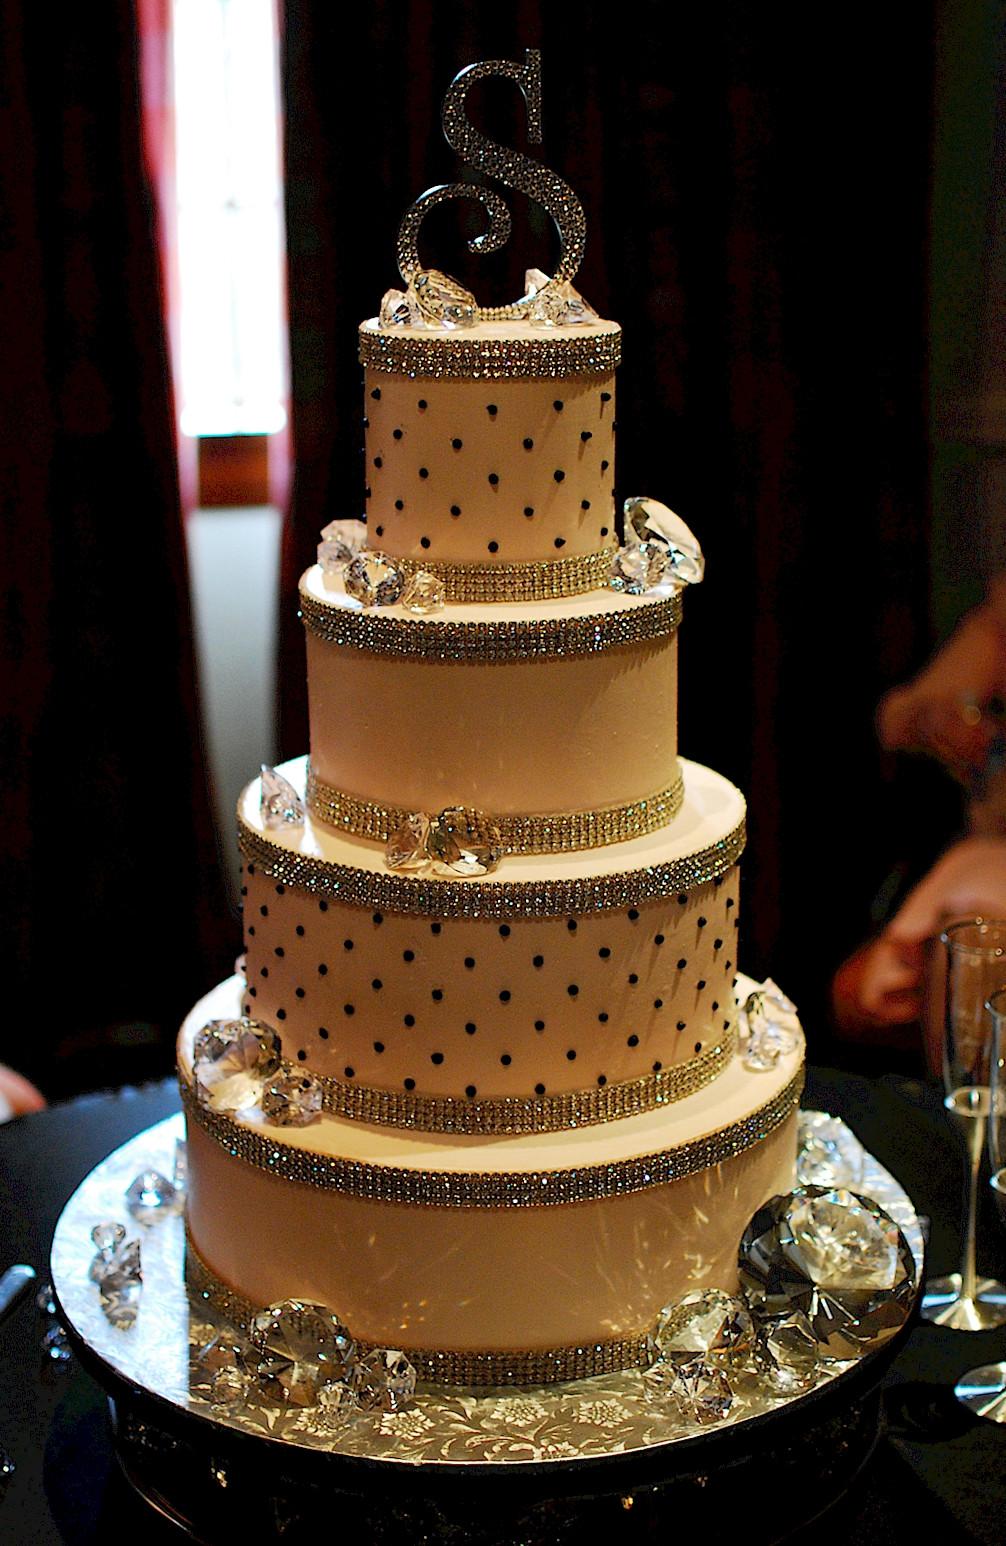 Diamond Wedding Cakes  Cup a Dee Cakes Blog Super Bling Diamond Wedding Cake